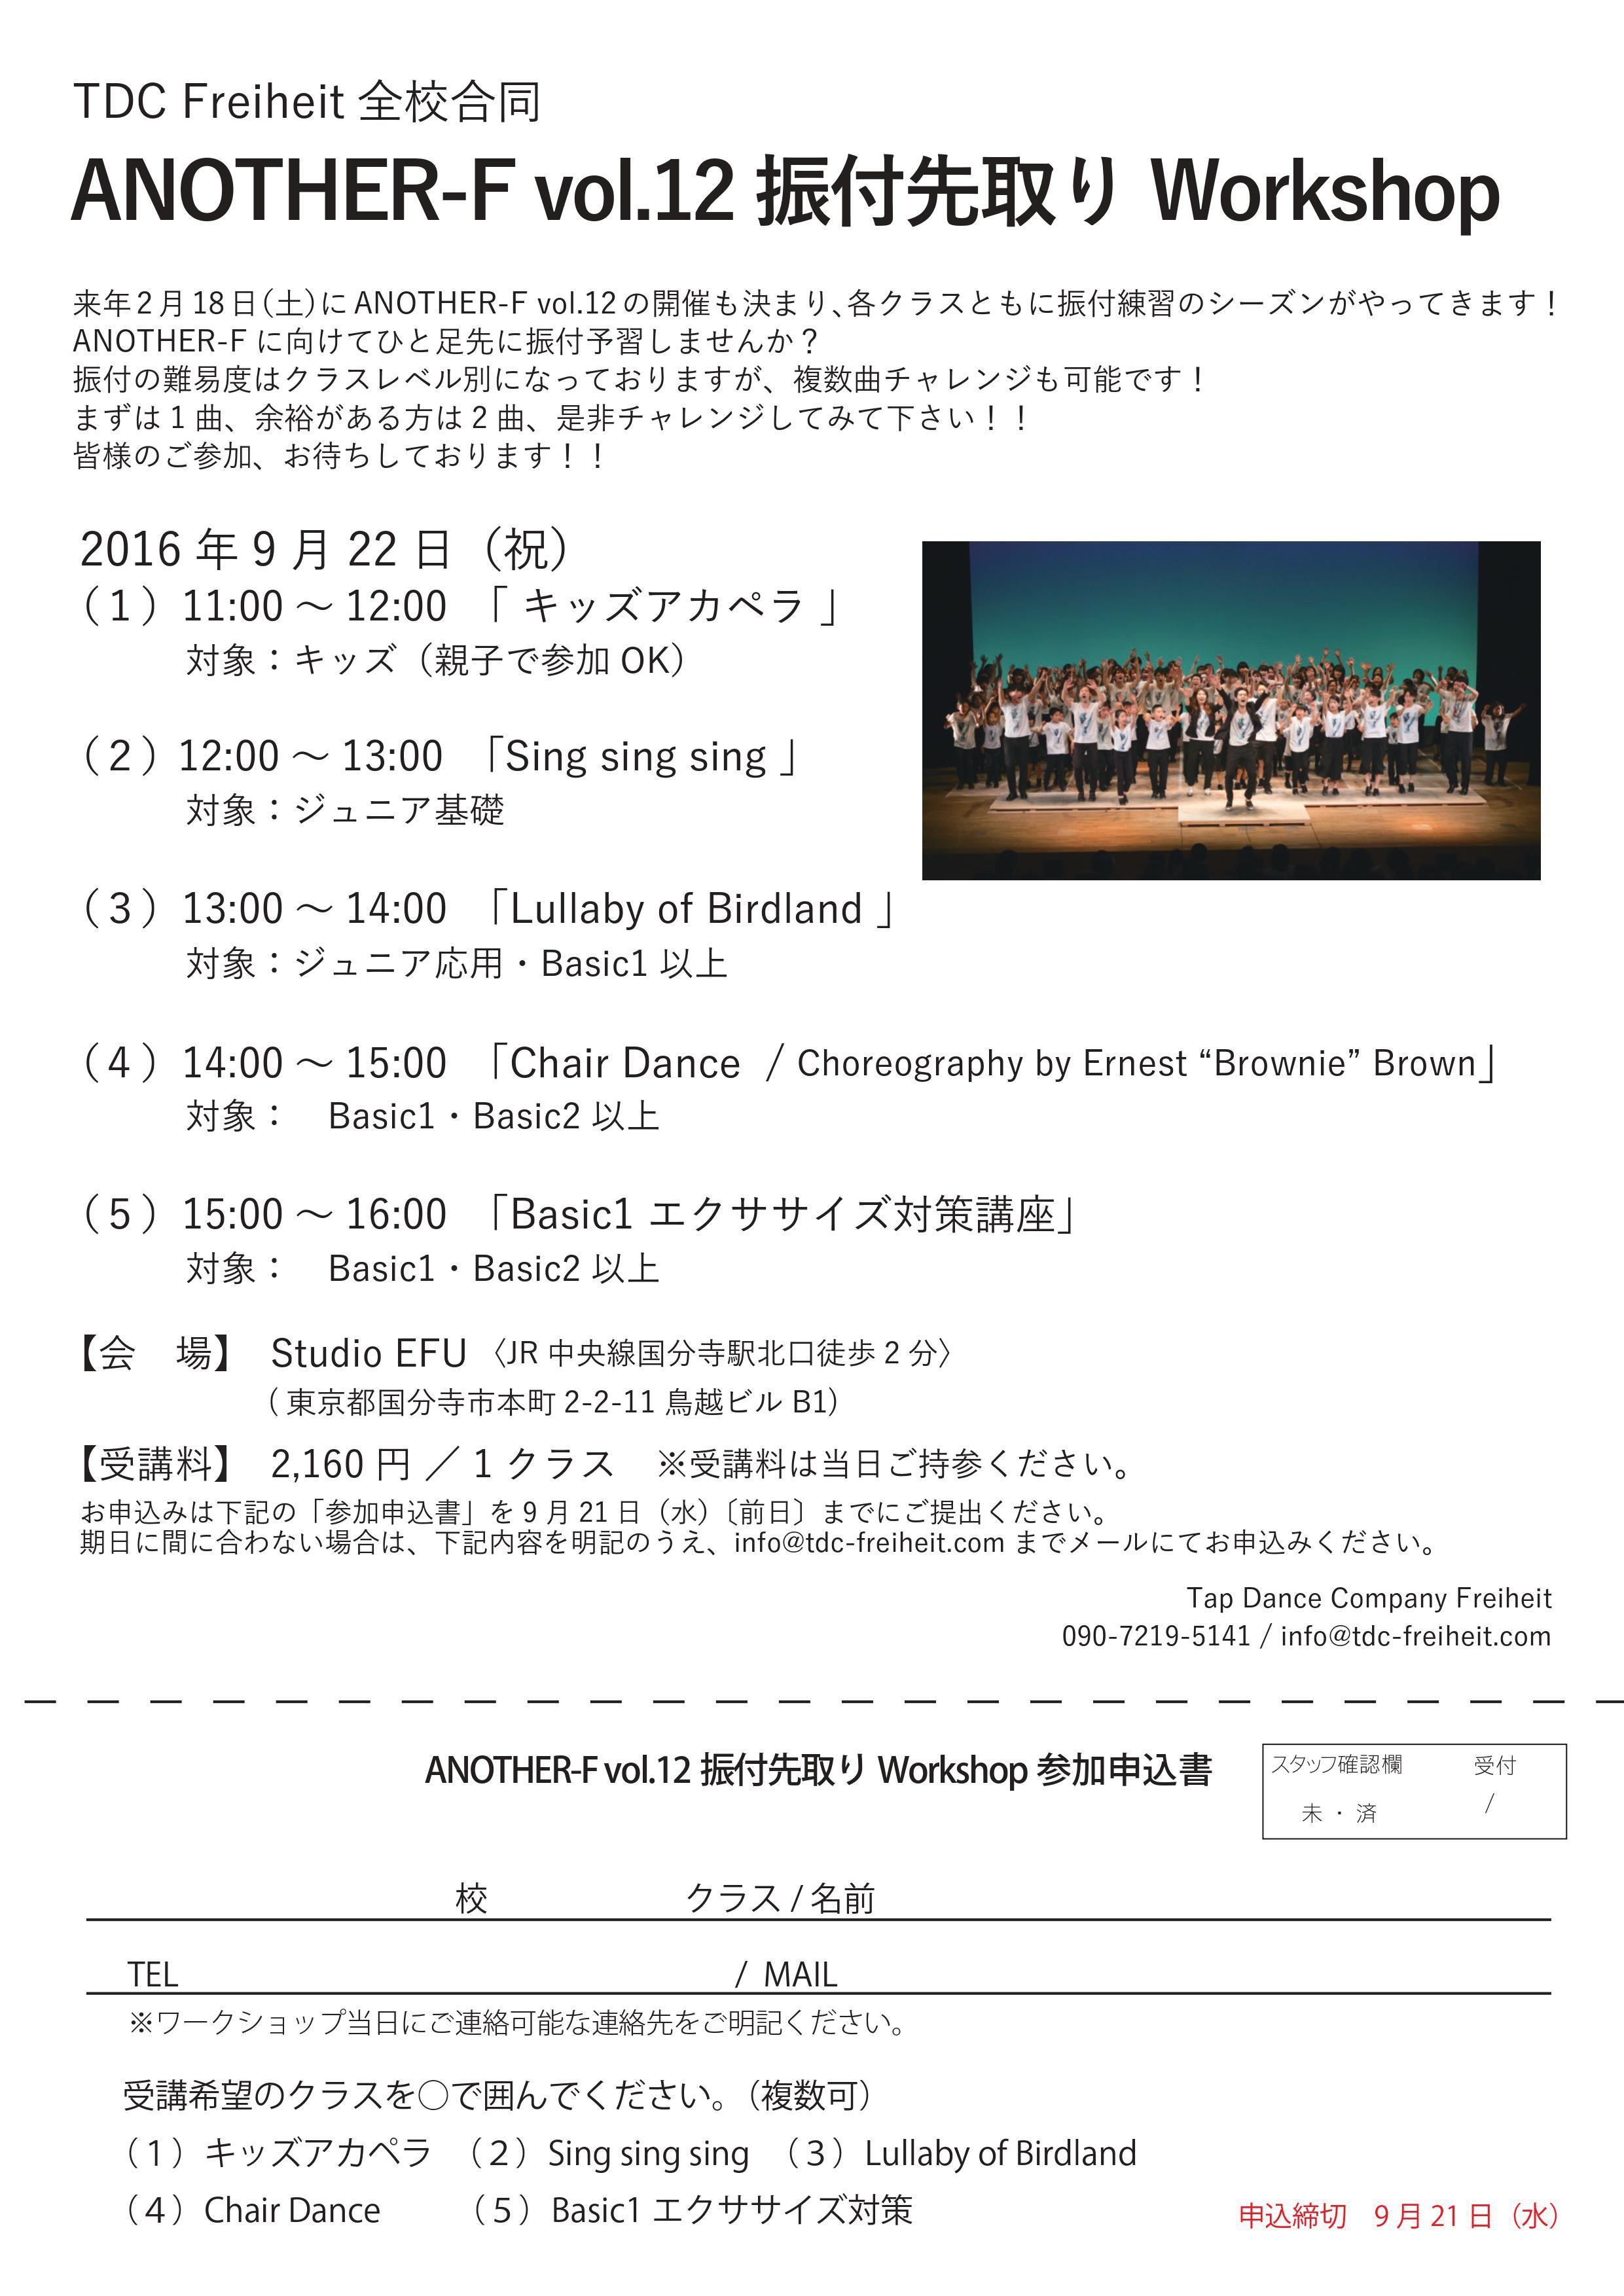 20160922_ANO-F12先取りWS